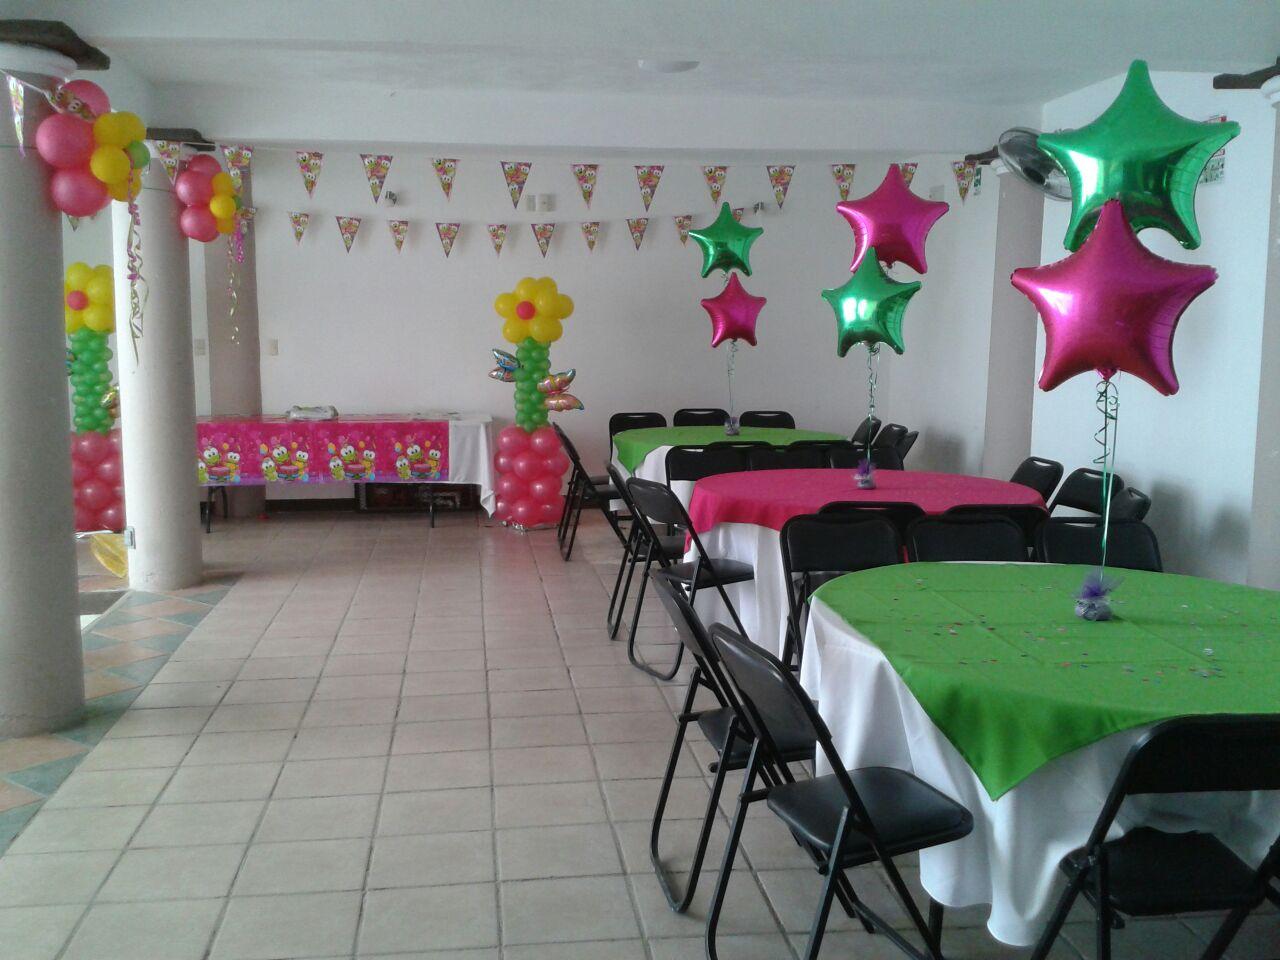 Salon de fiestas infantiles en tuxtla gutierrez chiapas - Fotos de salones ...